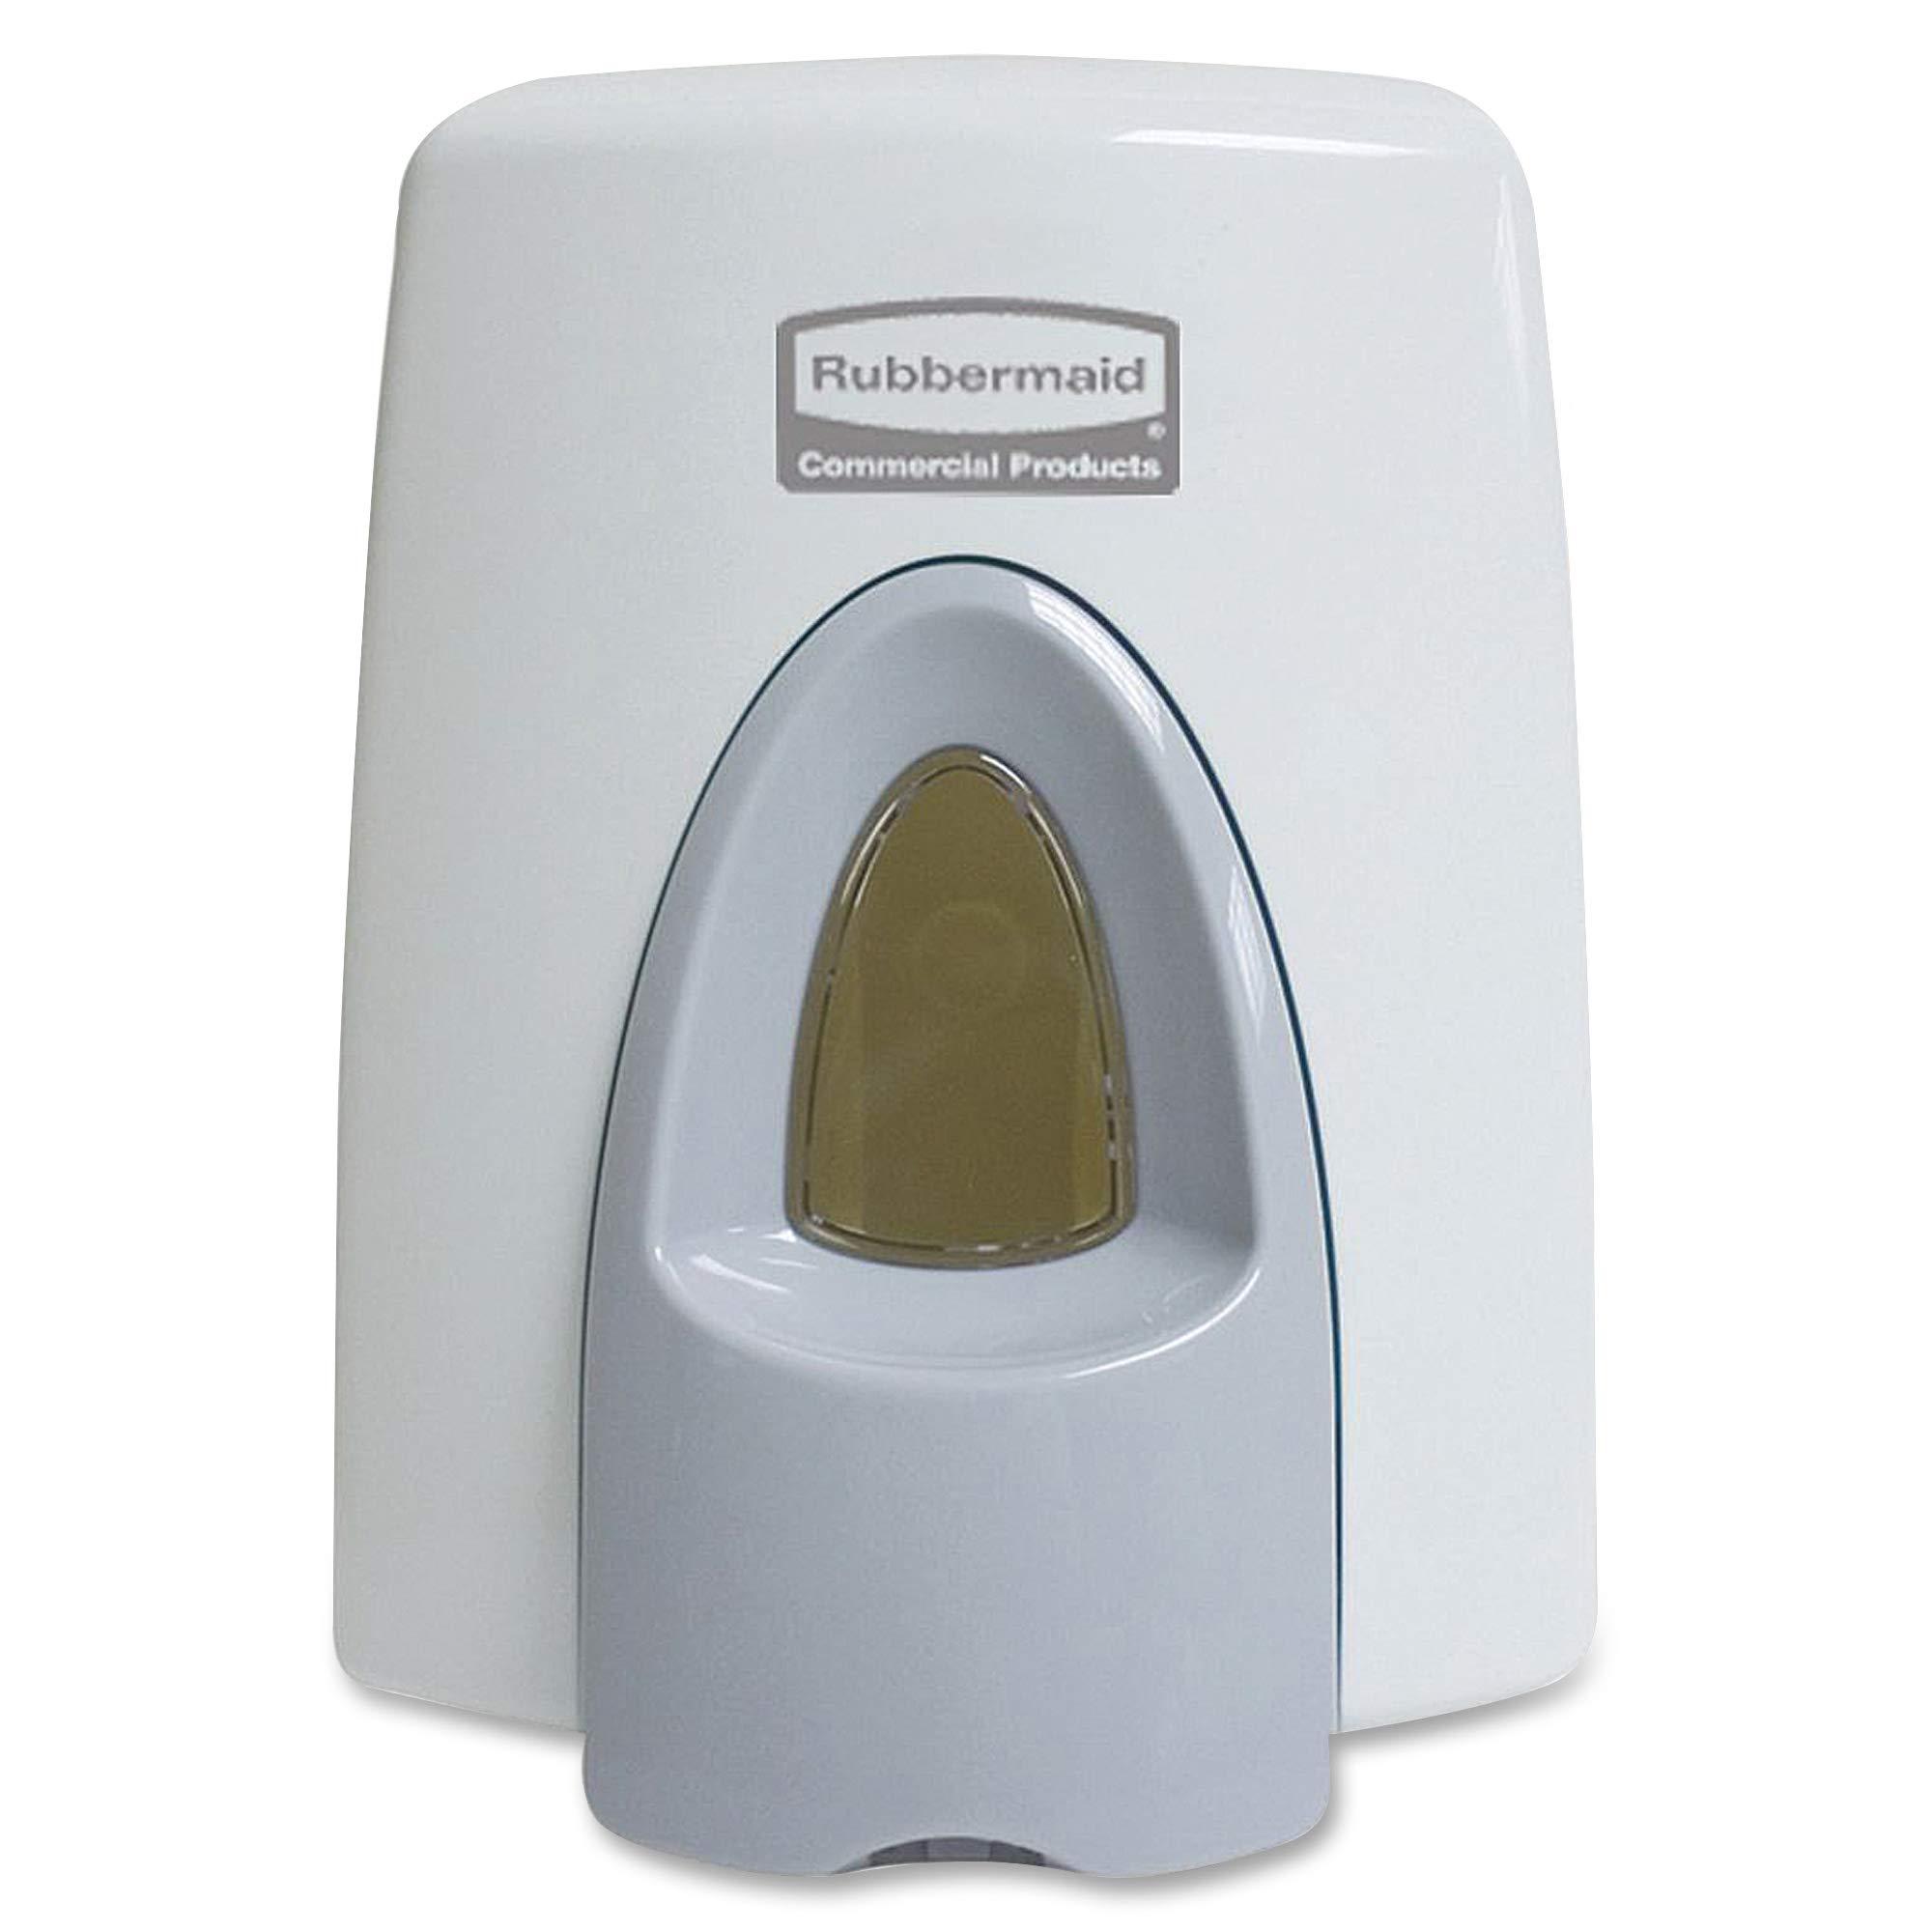 Rubbermaid Commercial FG402310 Clean Seat Foam Toilet Cleaner System Dispenser, 400ml, White